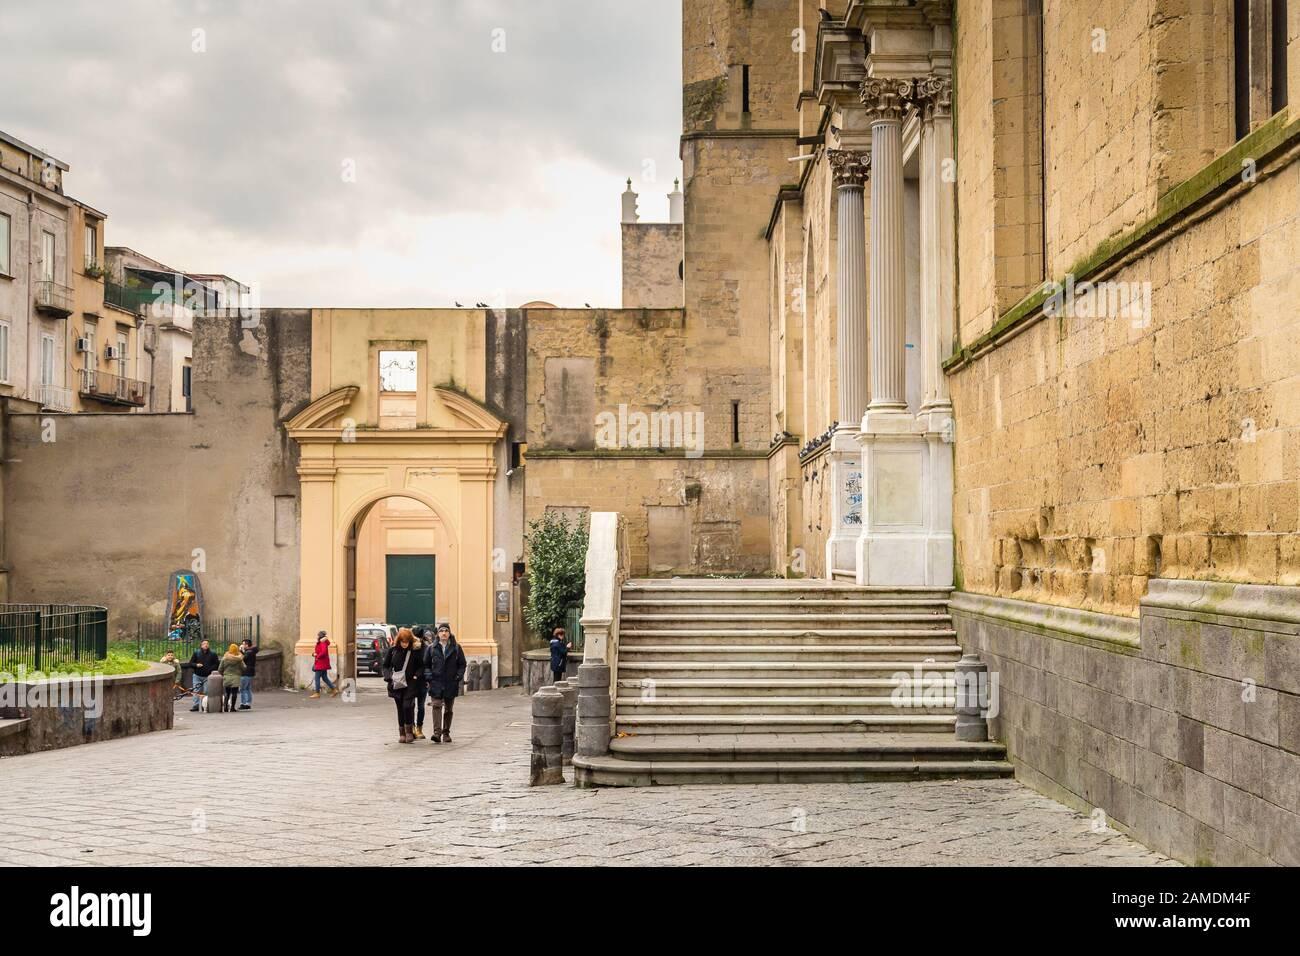 NAPLES, ITALY - JANUARY 4, 2020: tourists visiting THE monumental complex of Santa Chiara Stock Photo